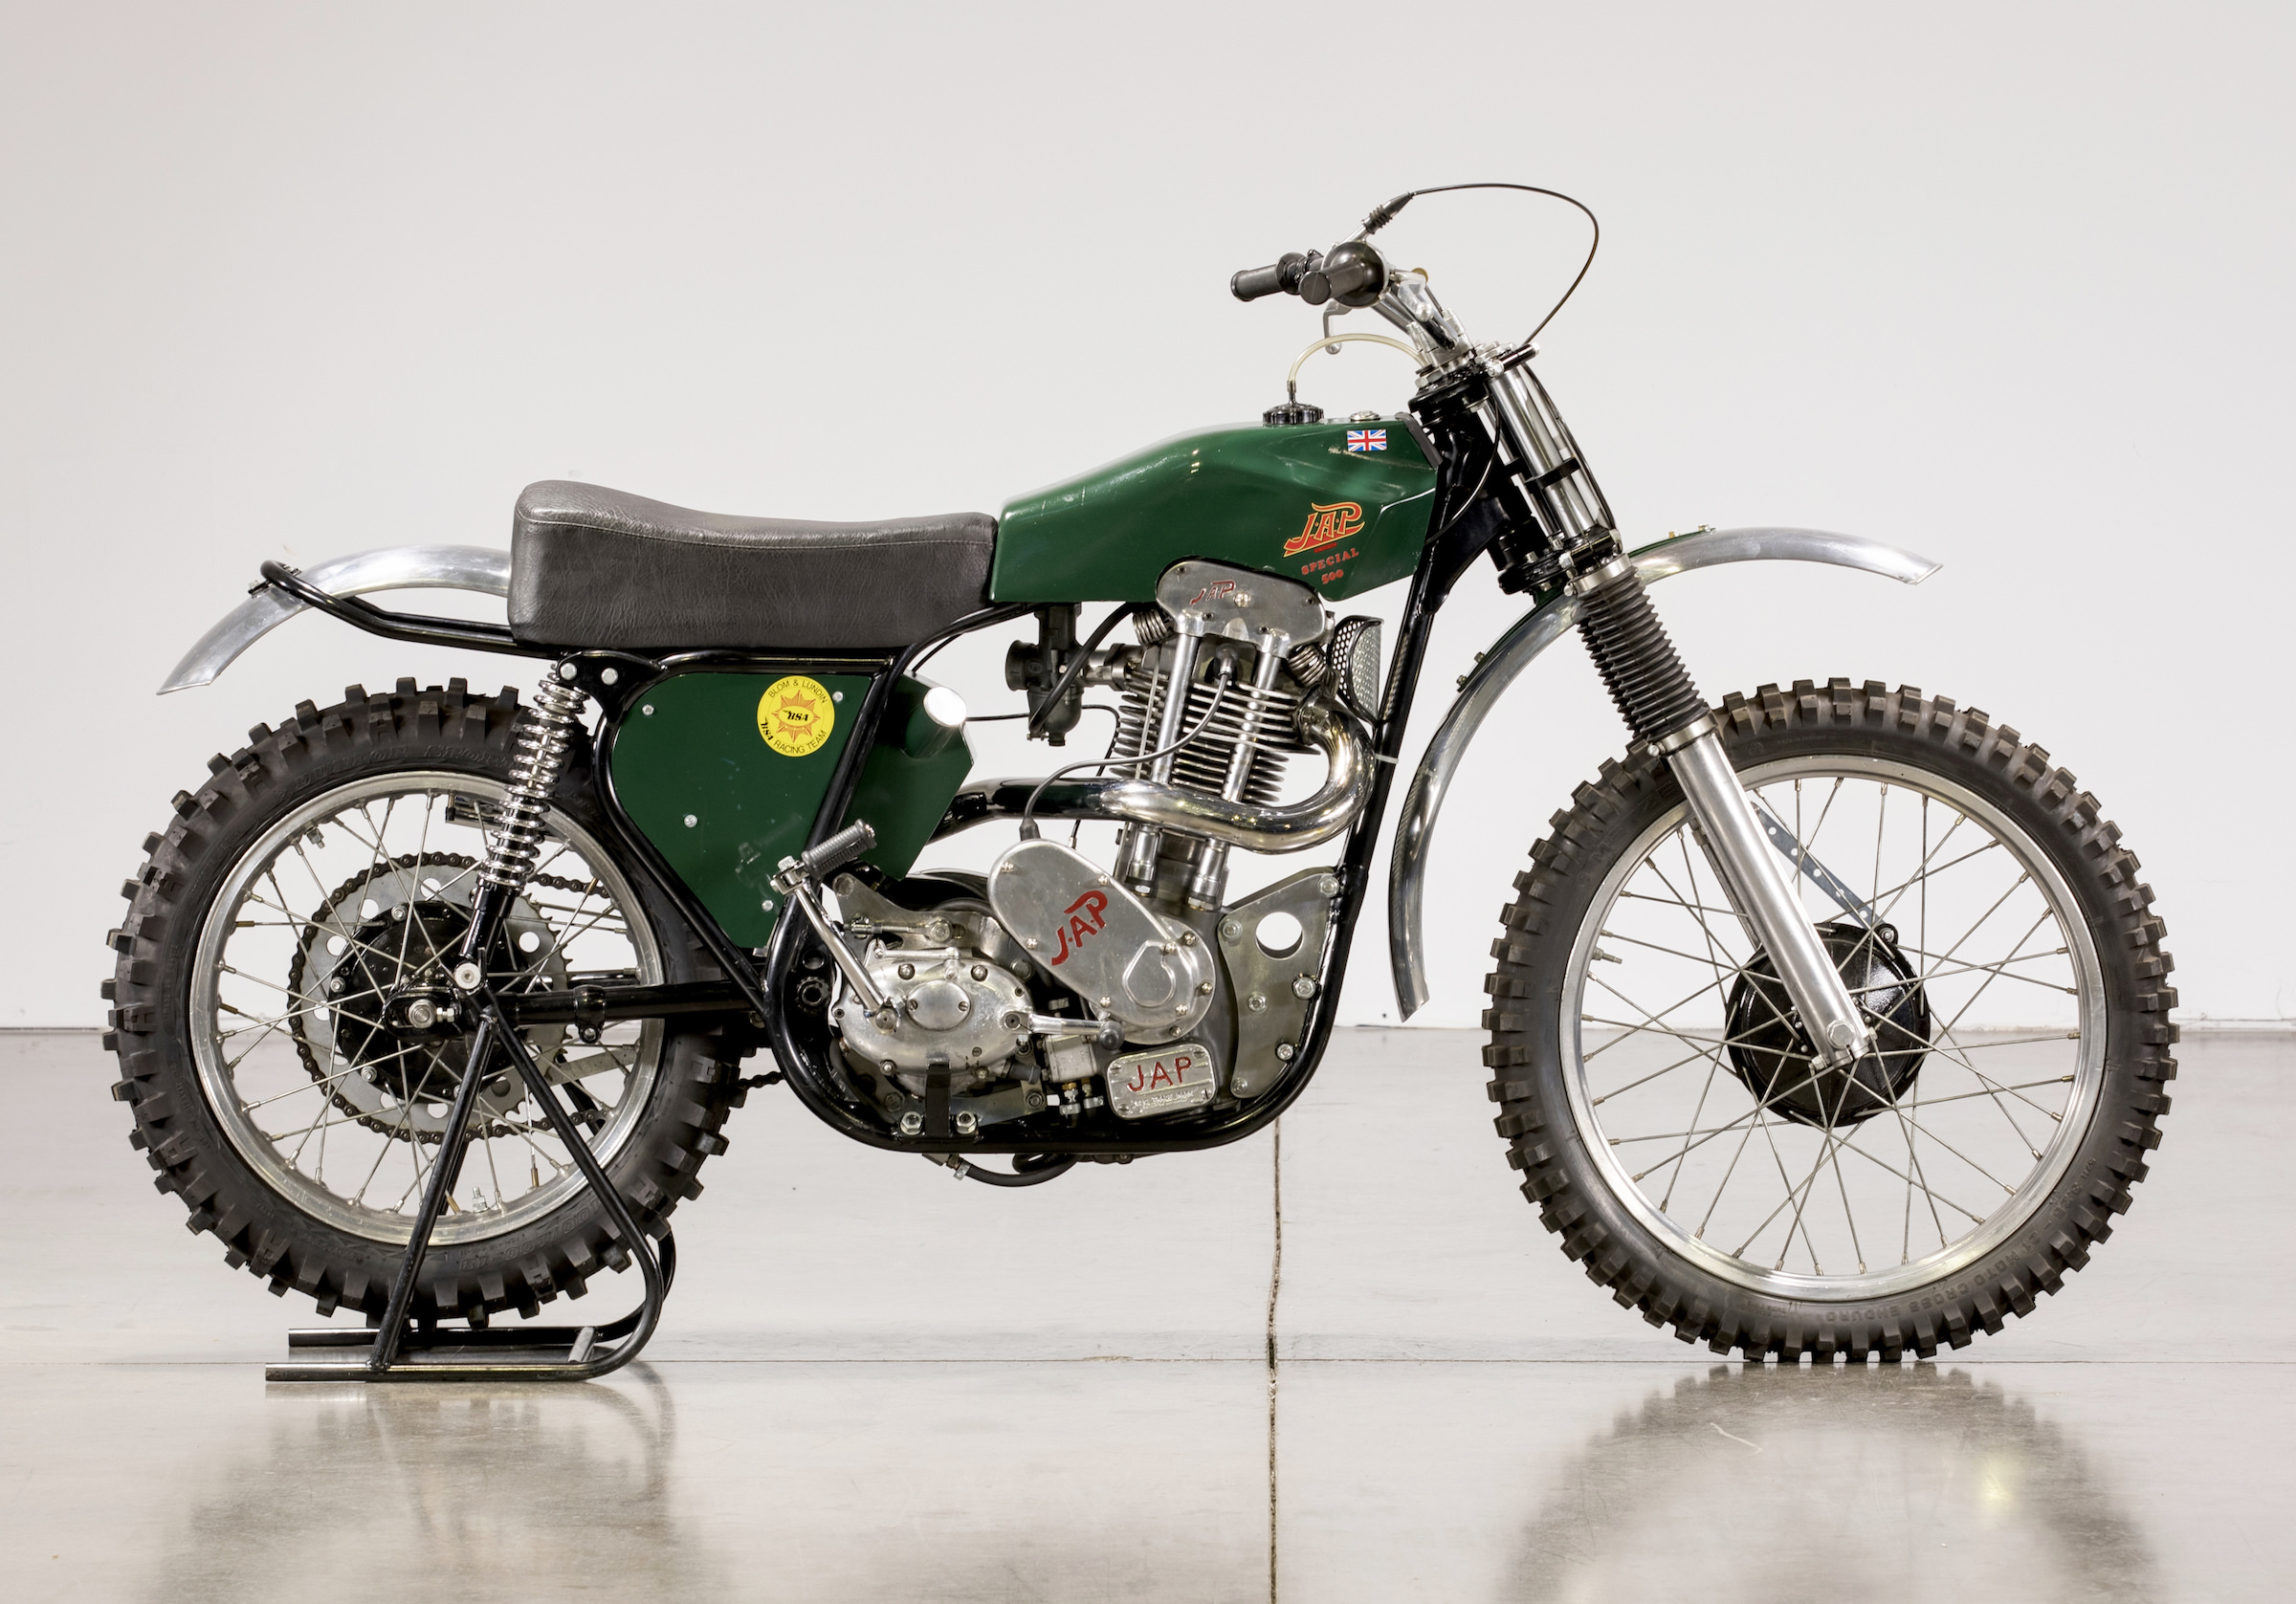 JAP BSA Motocross Motorcycle